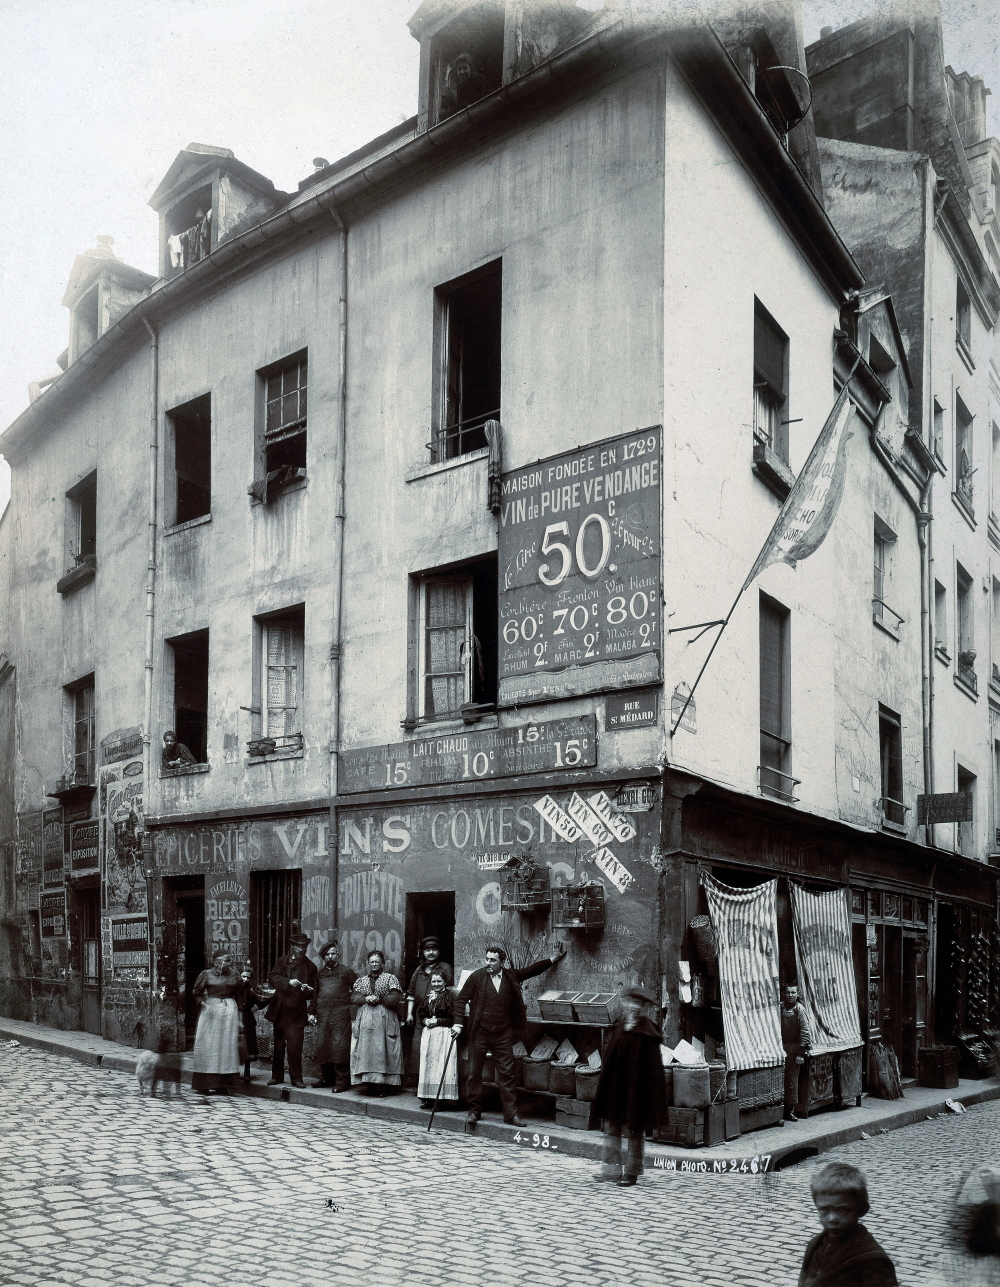 1898,UPF,rue Saint-Médard,21, rue Saint-Médard,Paris,France